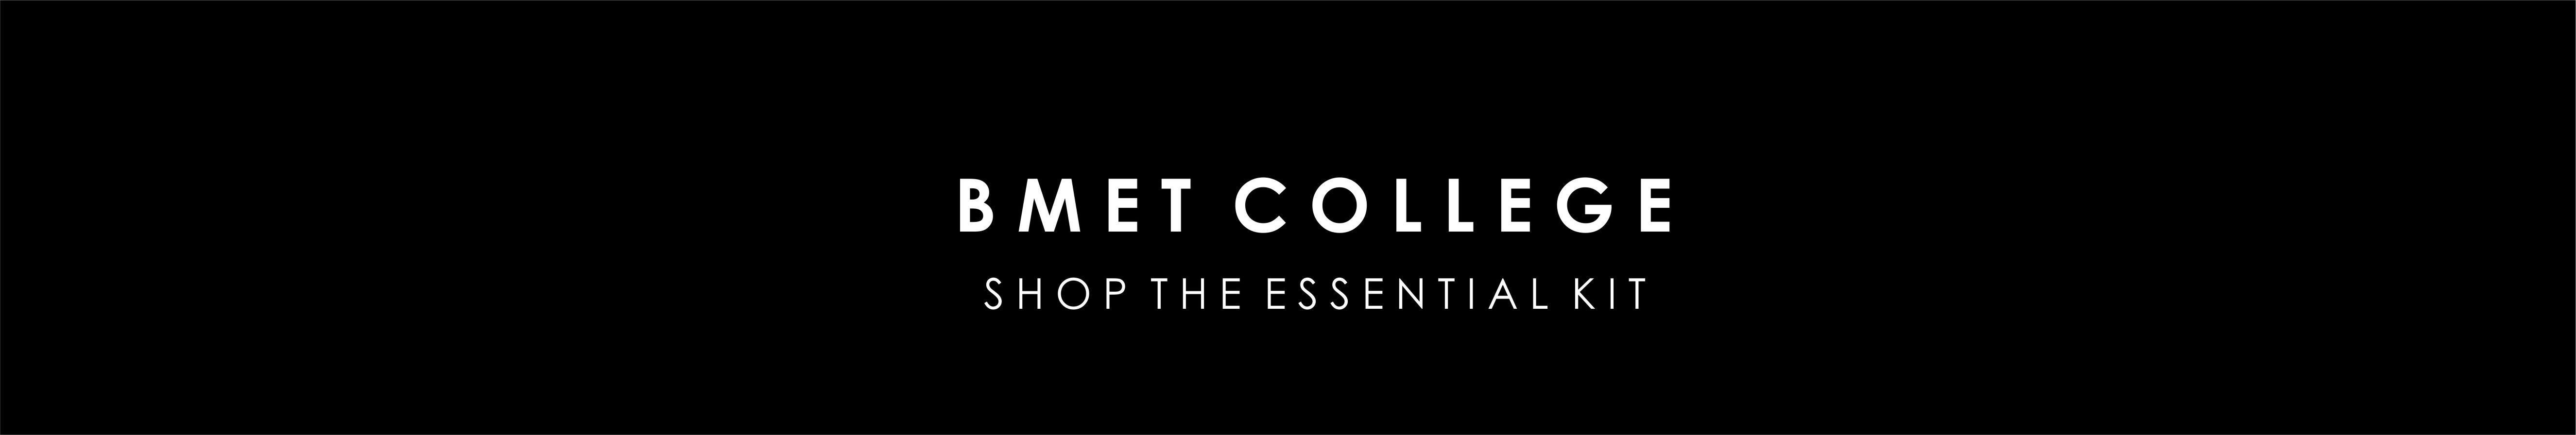 bmet-college-front-banner-parent-club.jpg